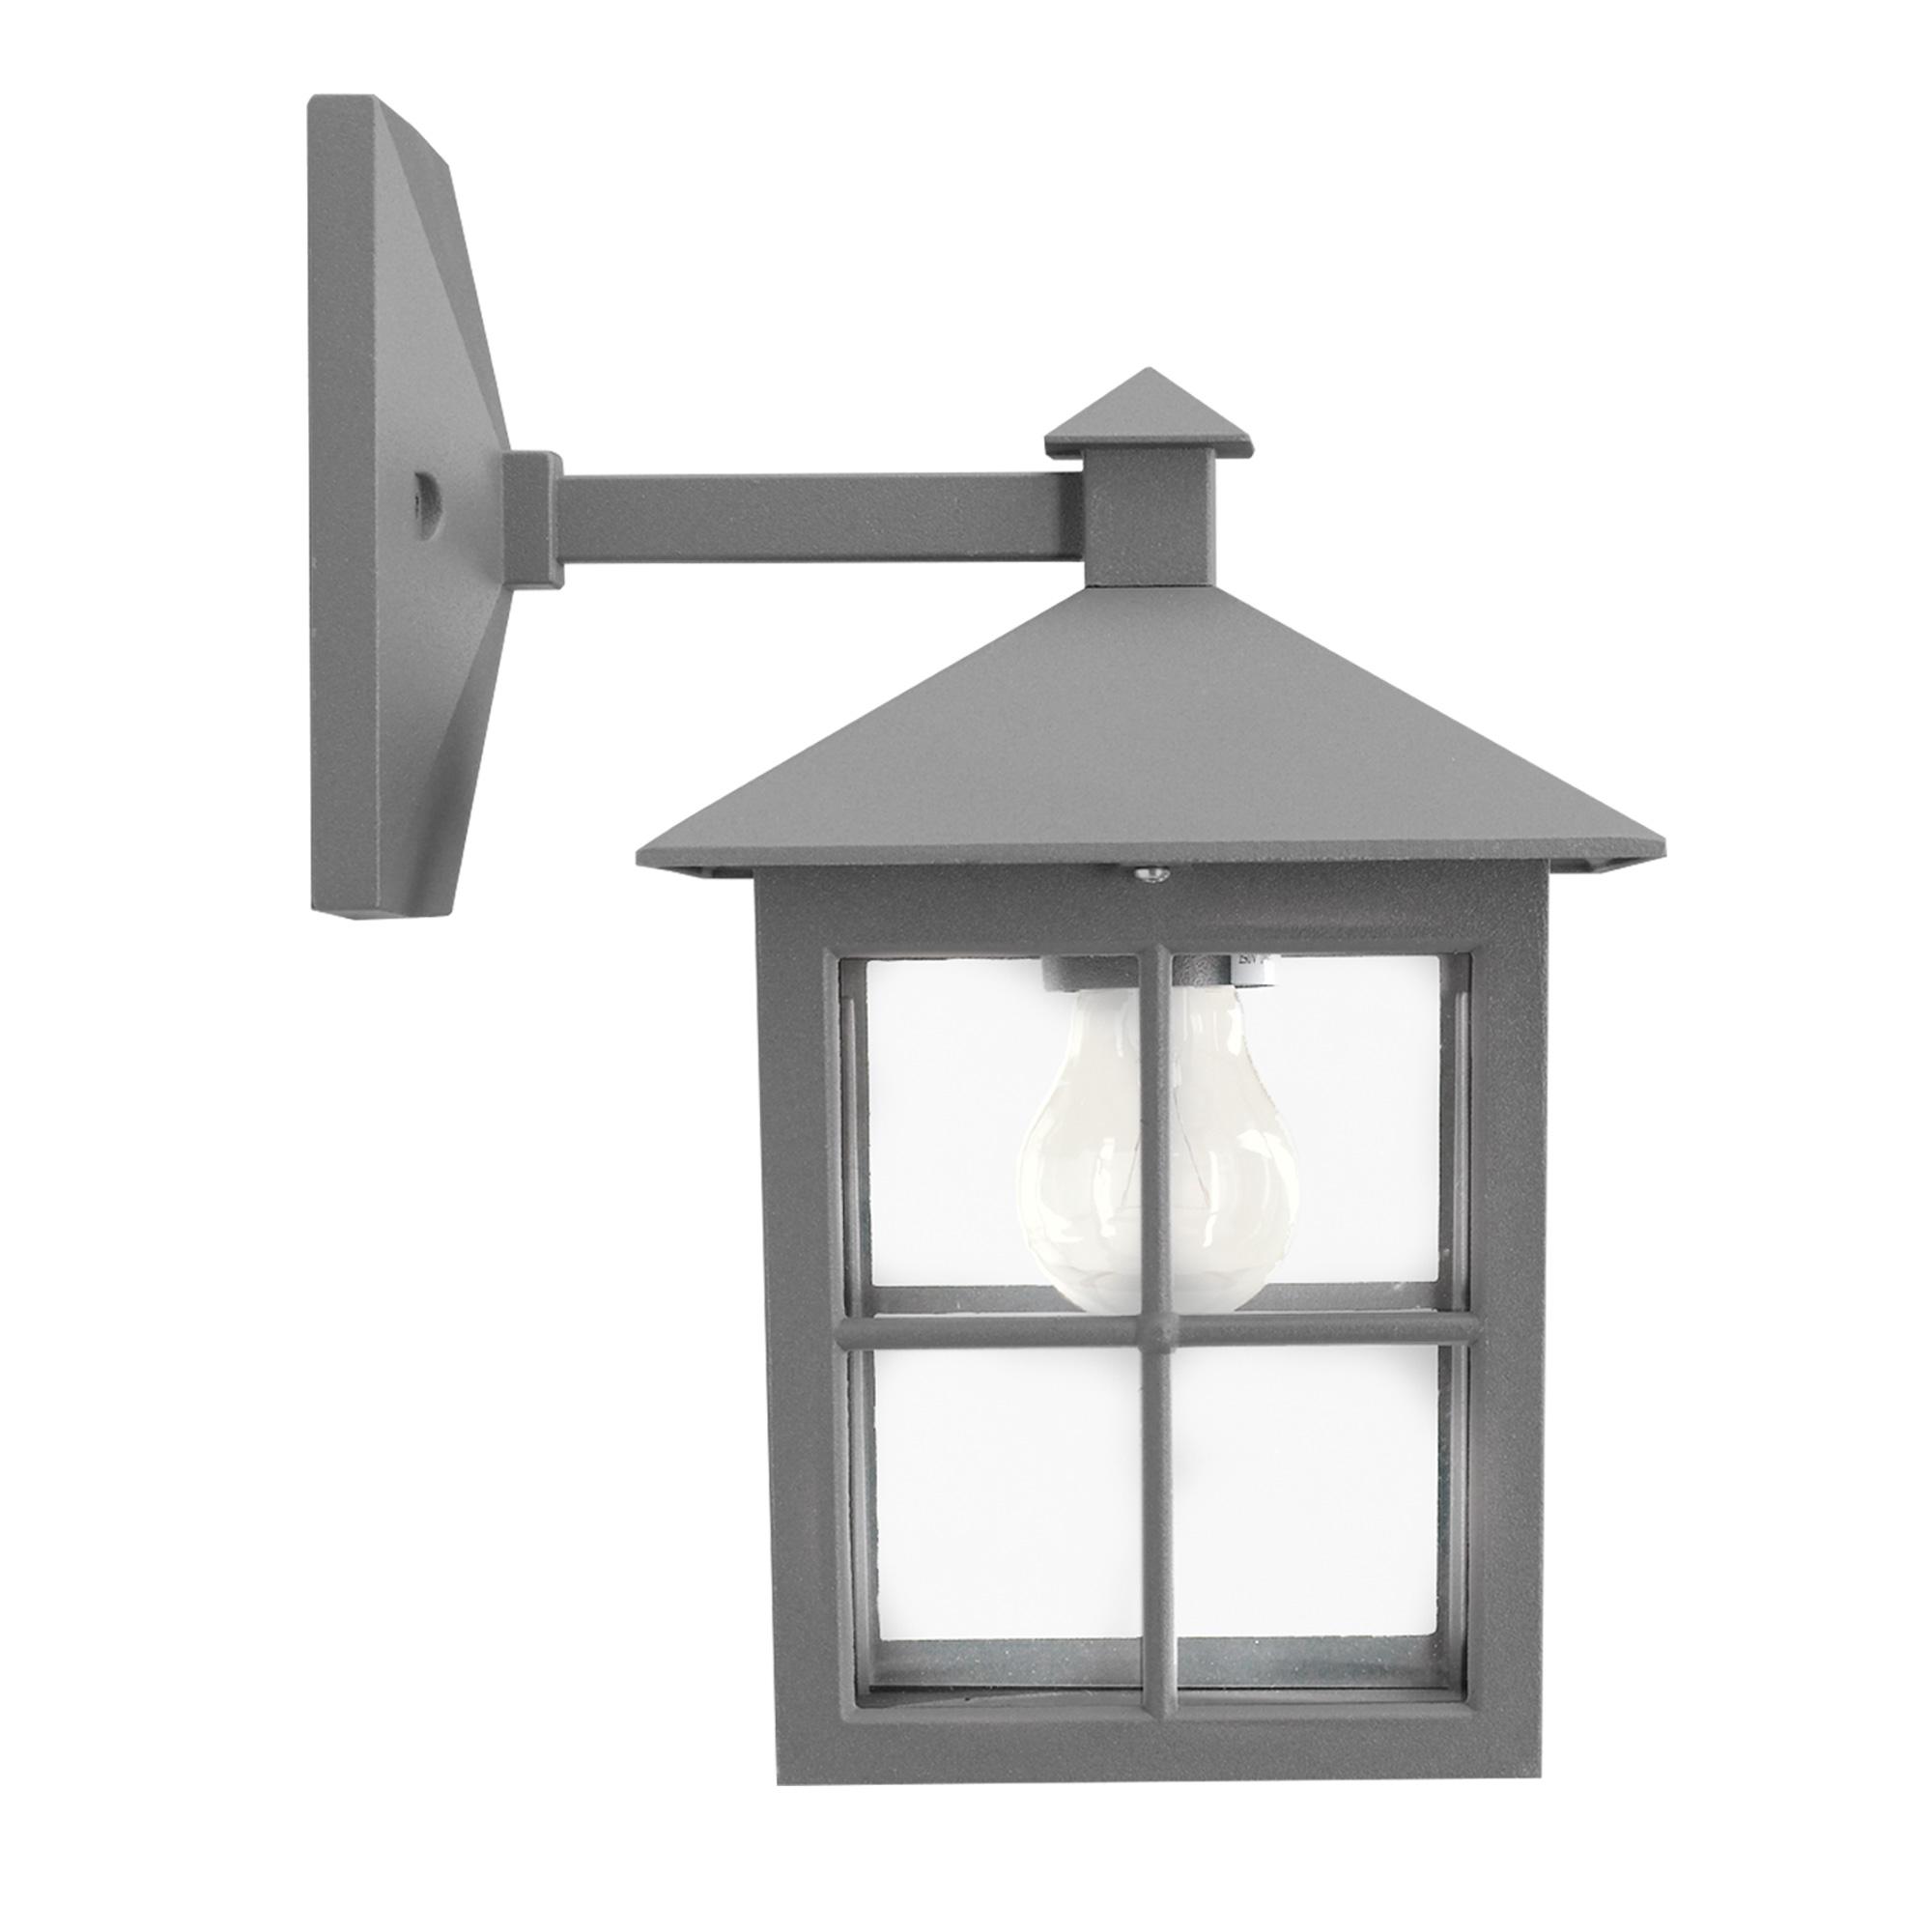 Buitenlamp Arlano Dag Nacht Schemersensor LED